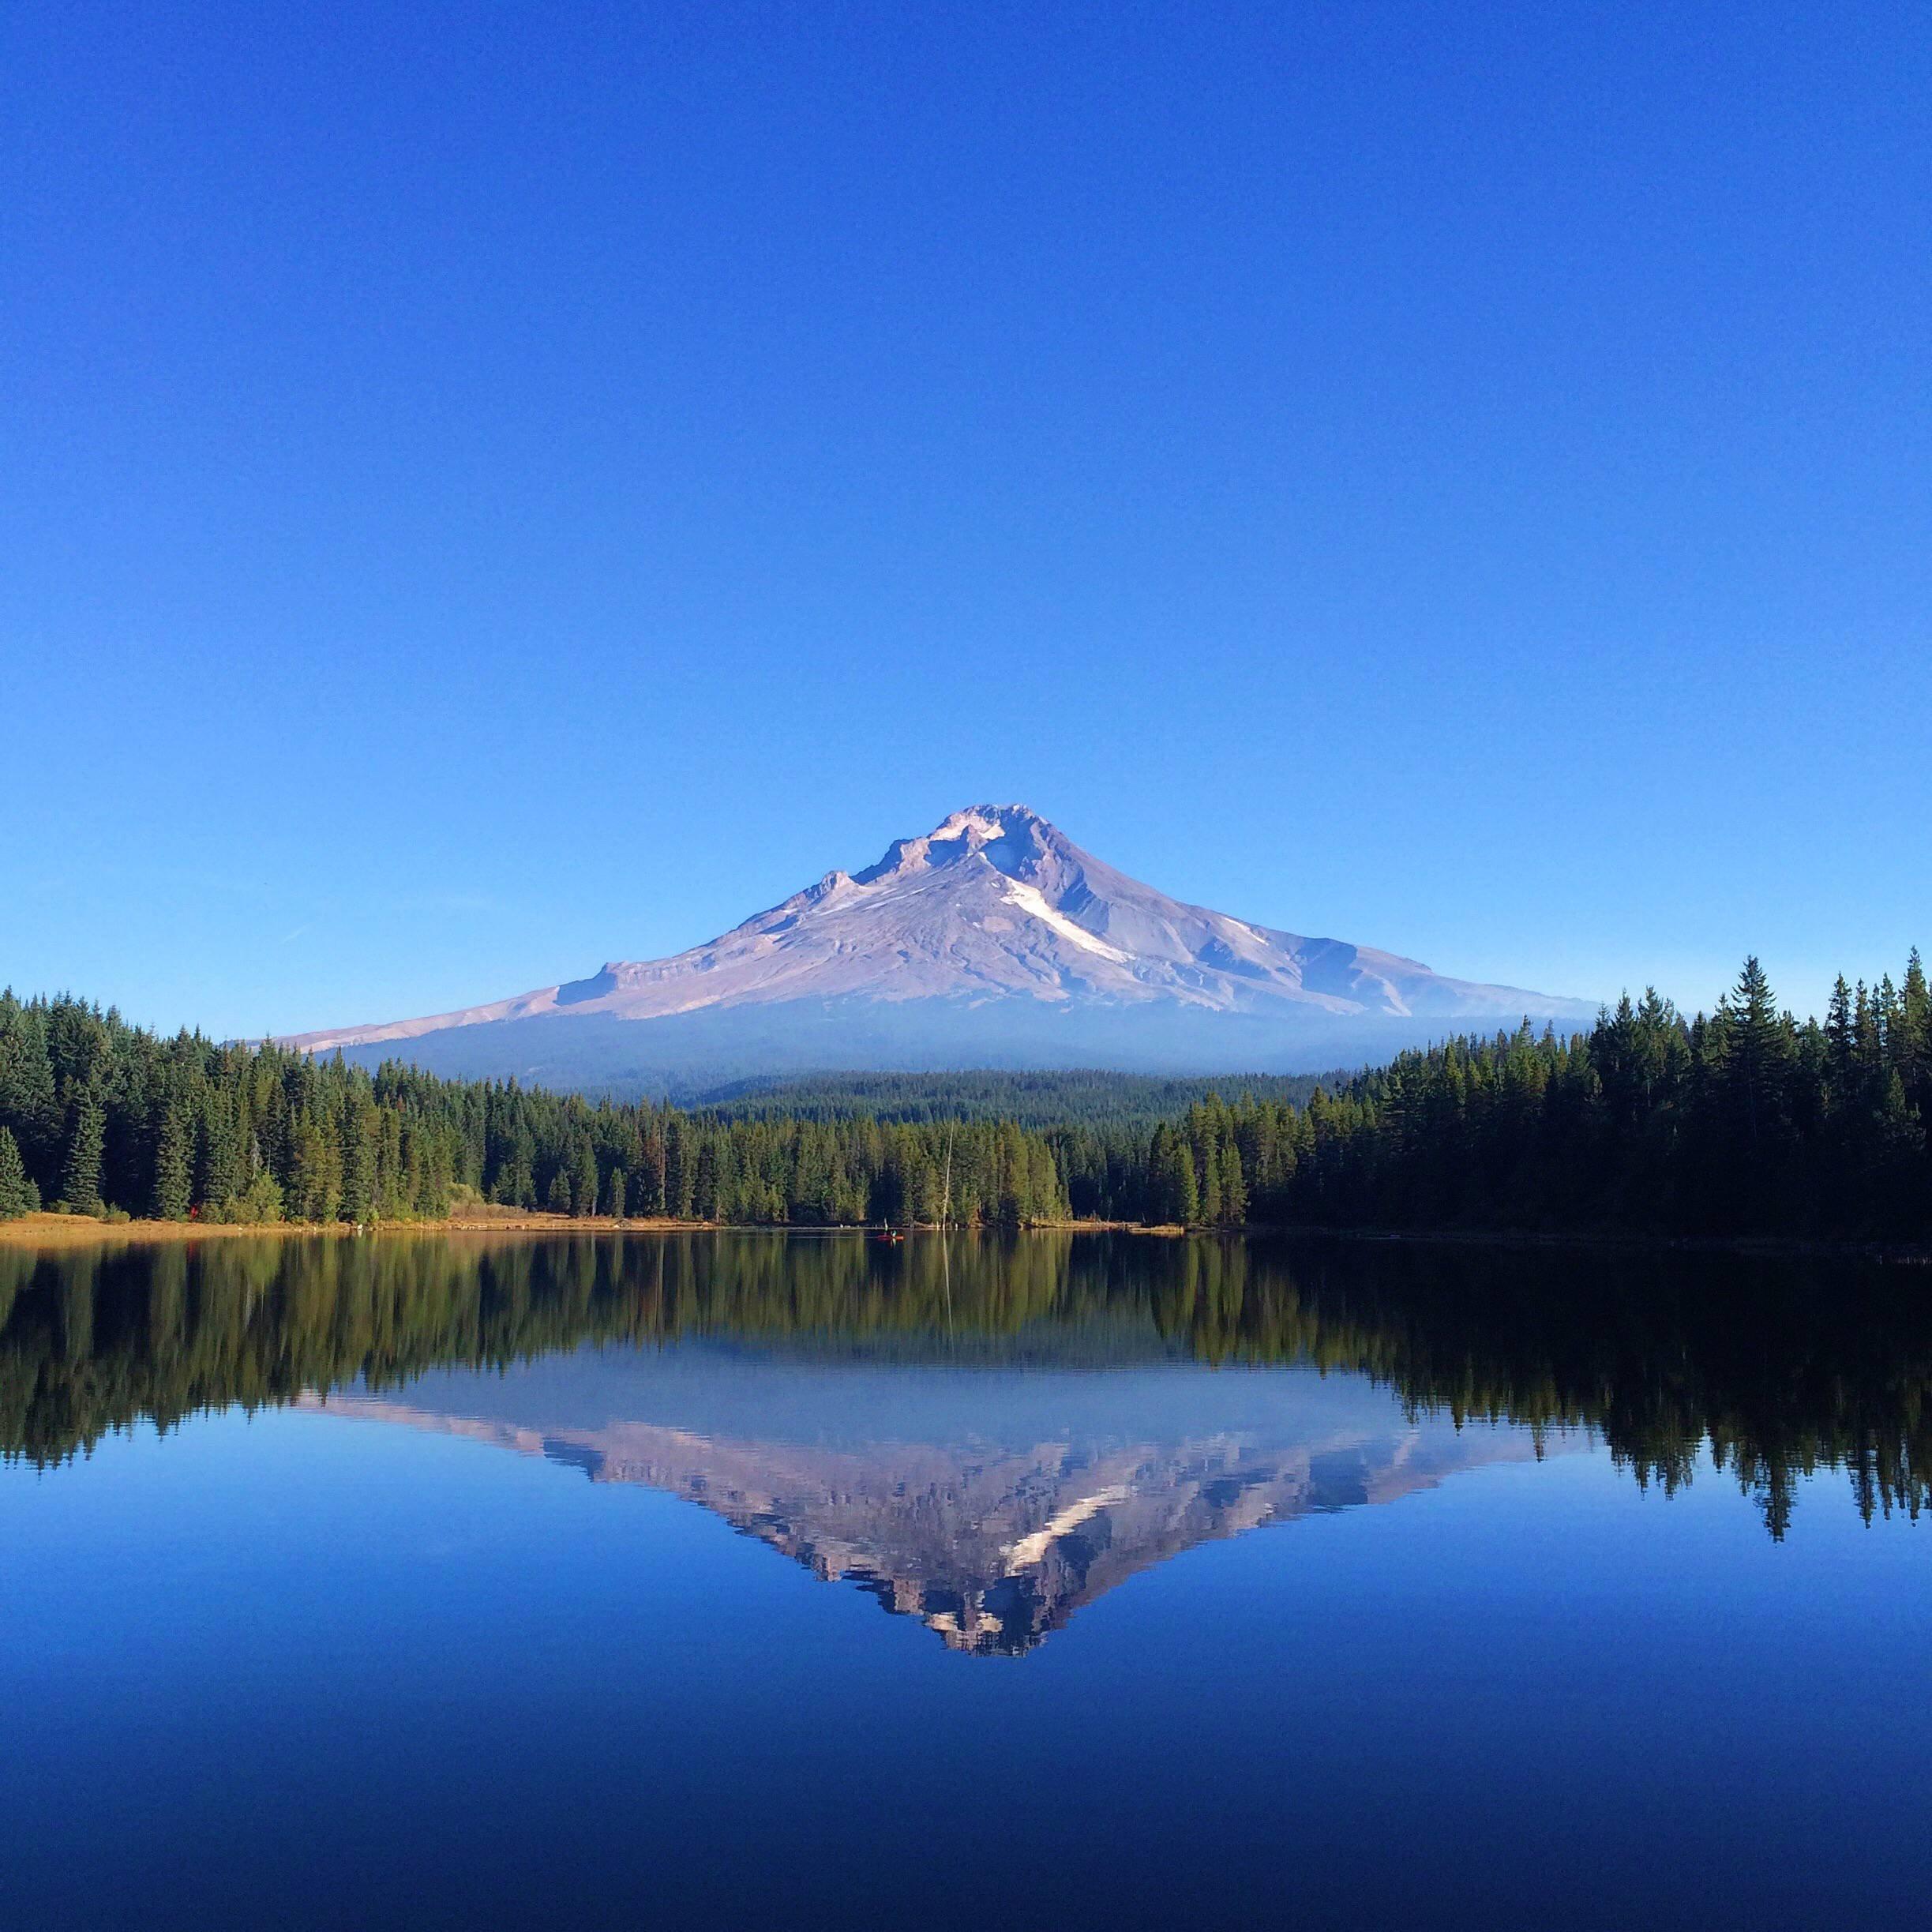 Trillium wallpapers photos and desktop backgrounds up to - Oregon nature wallpaper ...